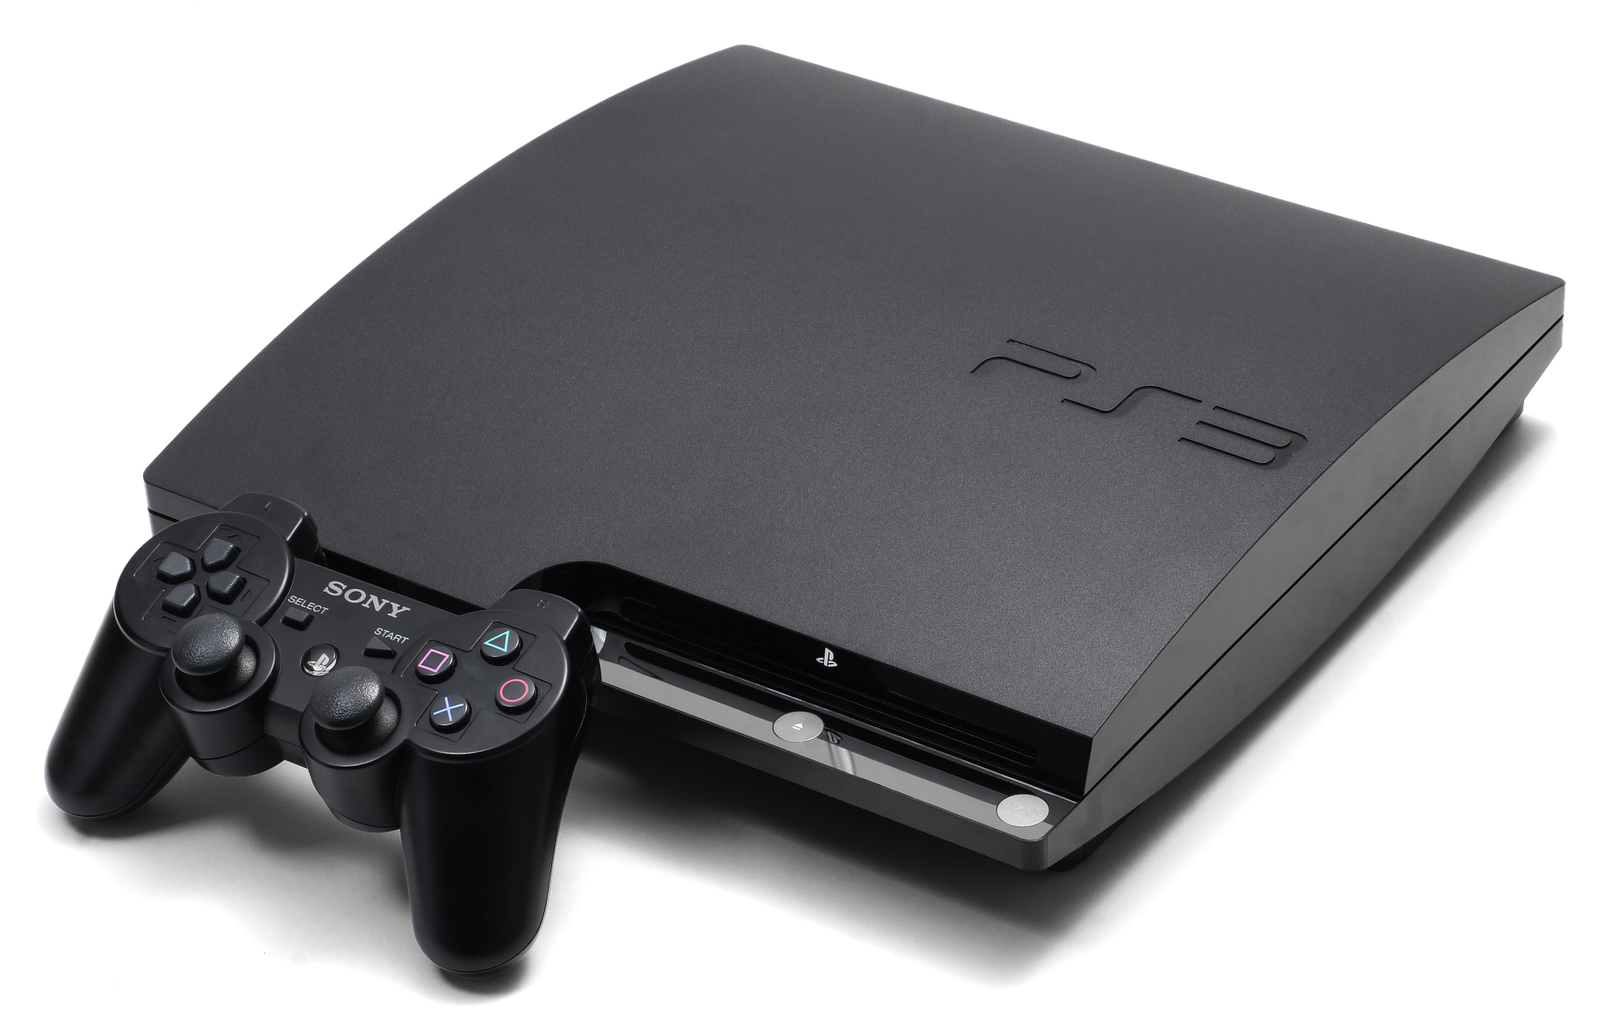 PlayStation3 320GB スプラッシュ・ブルー(旧薄型PS3本体・CECH-3000B SB)